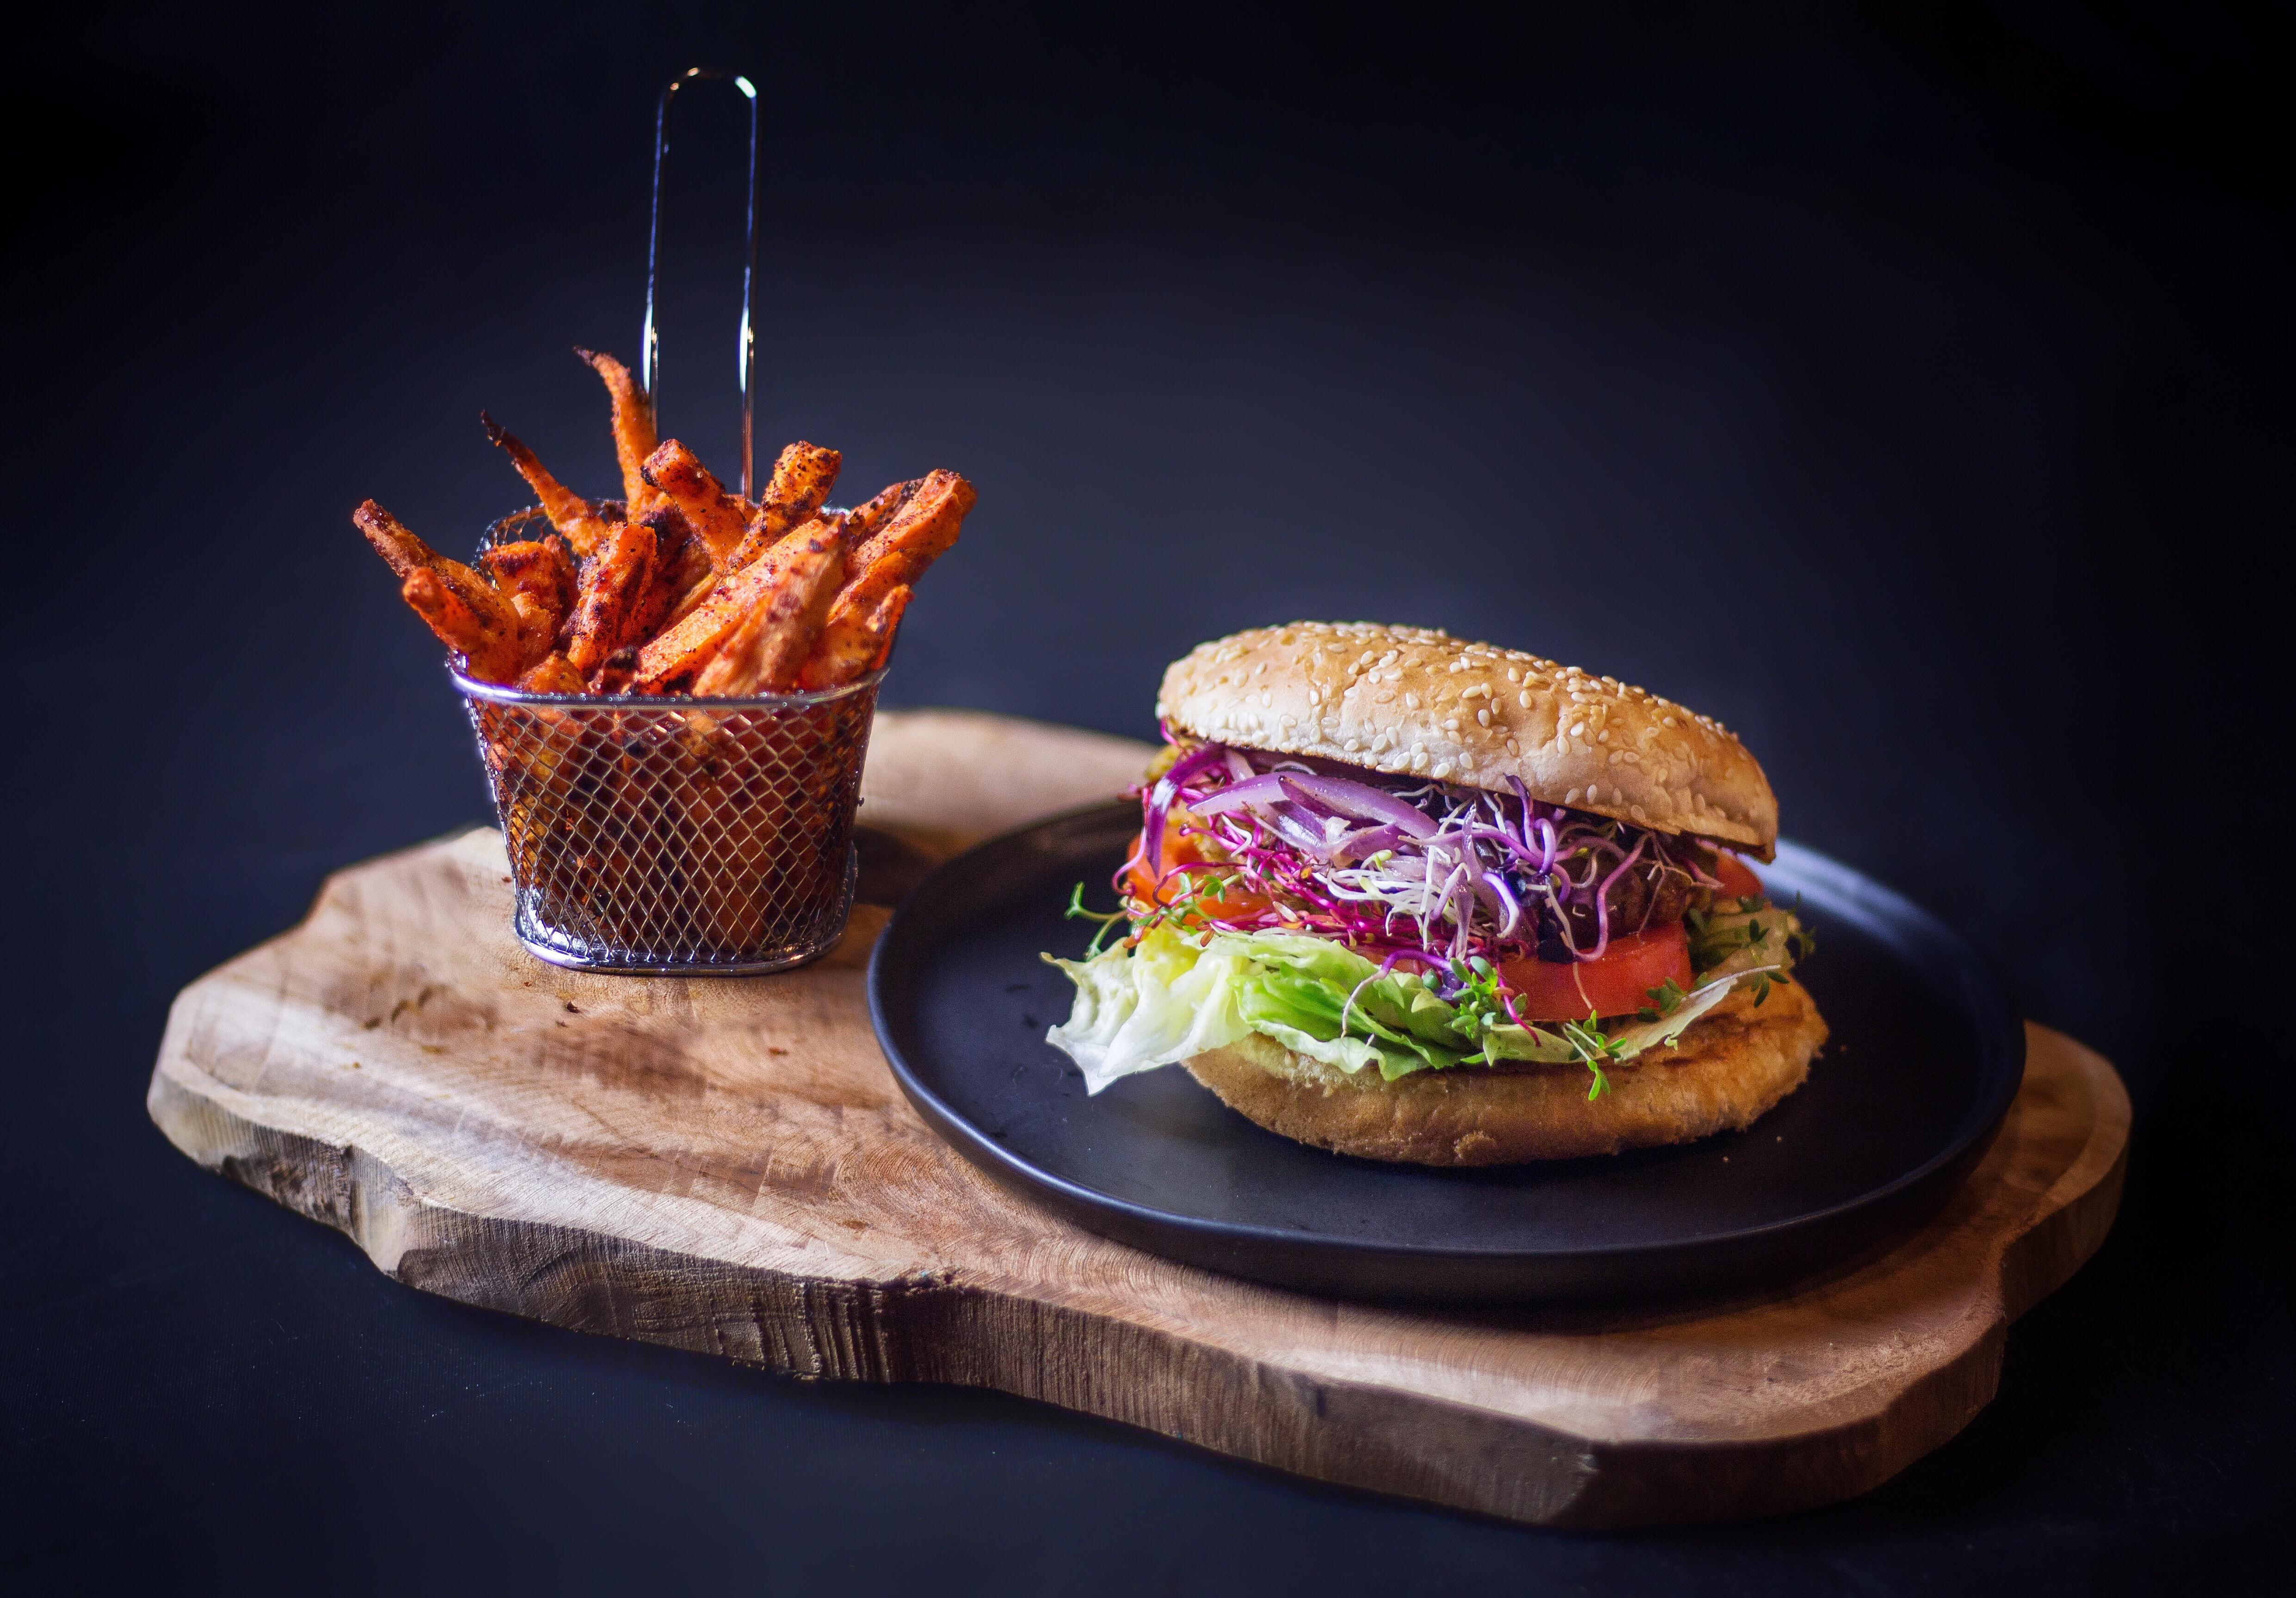 Food Photography pt.1#food #burger #foodblogger #foodporn #photography #foodphotography #fries #sweetpotato